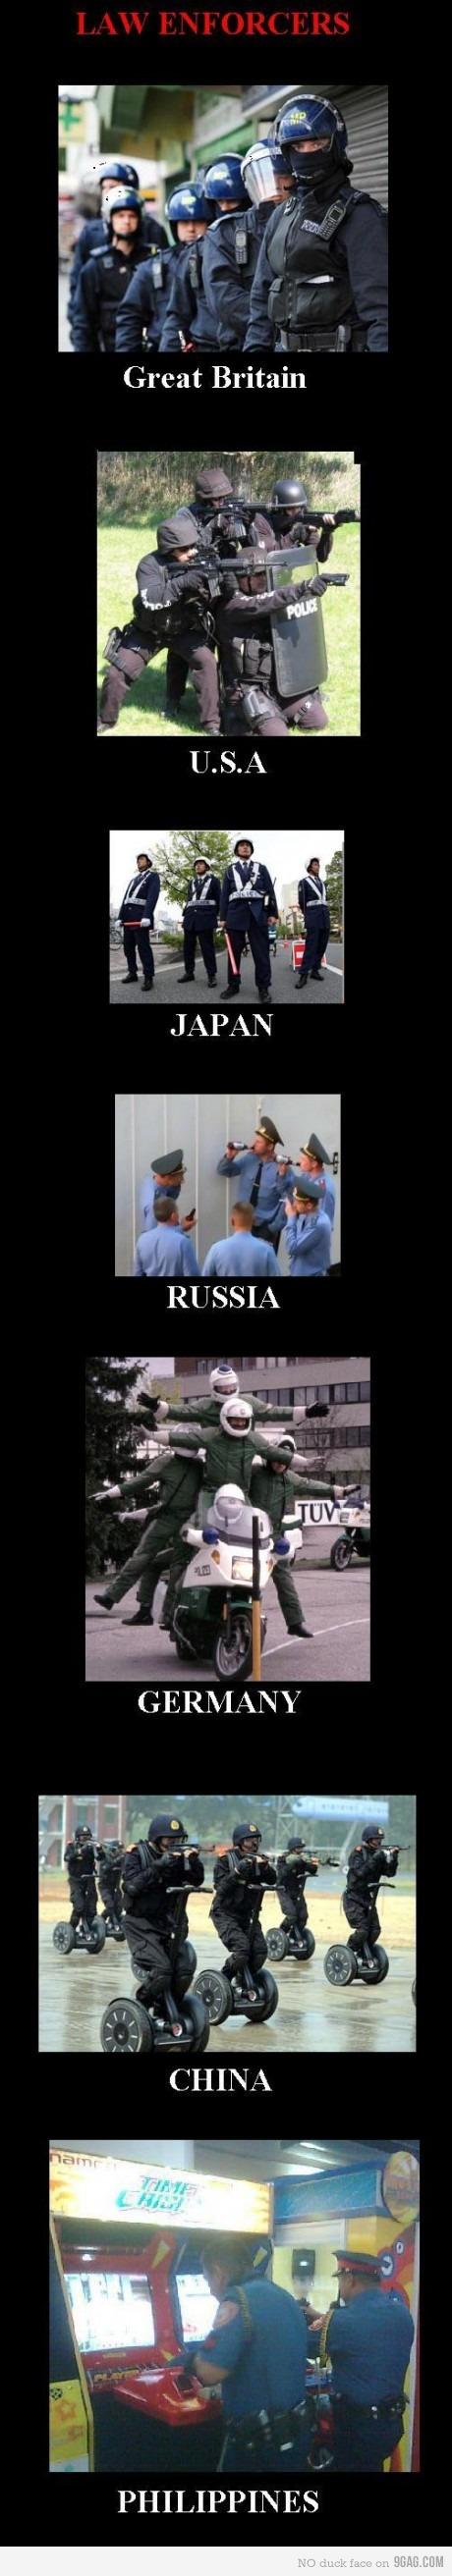 Police around the globe